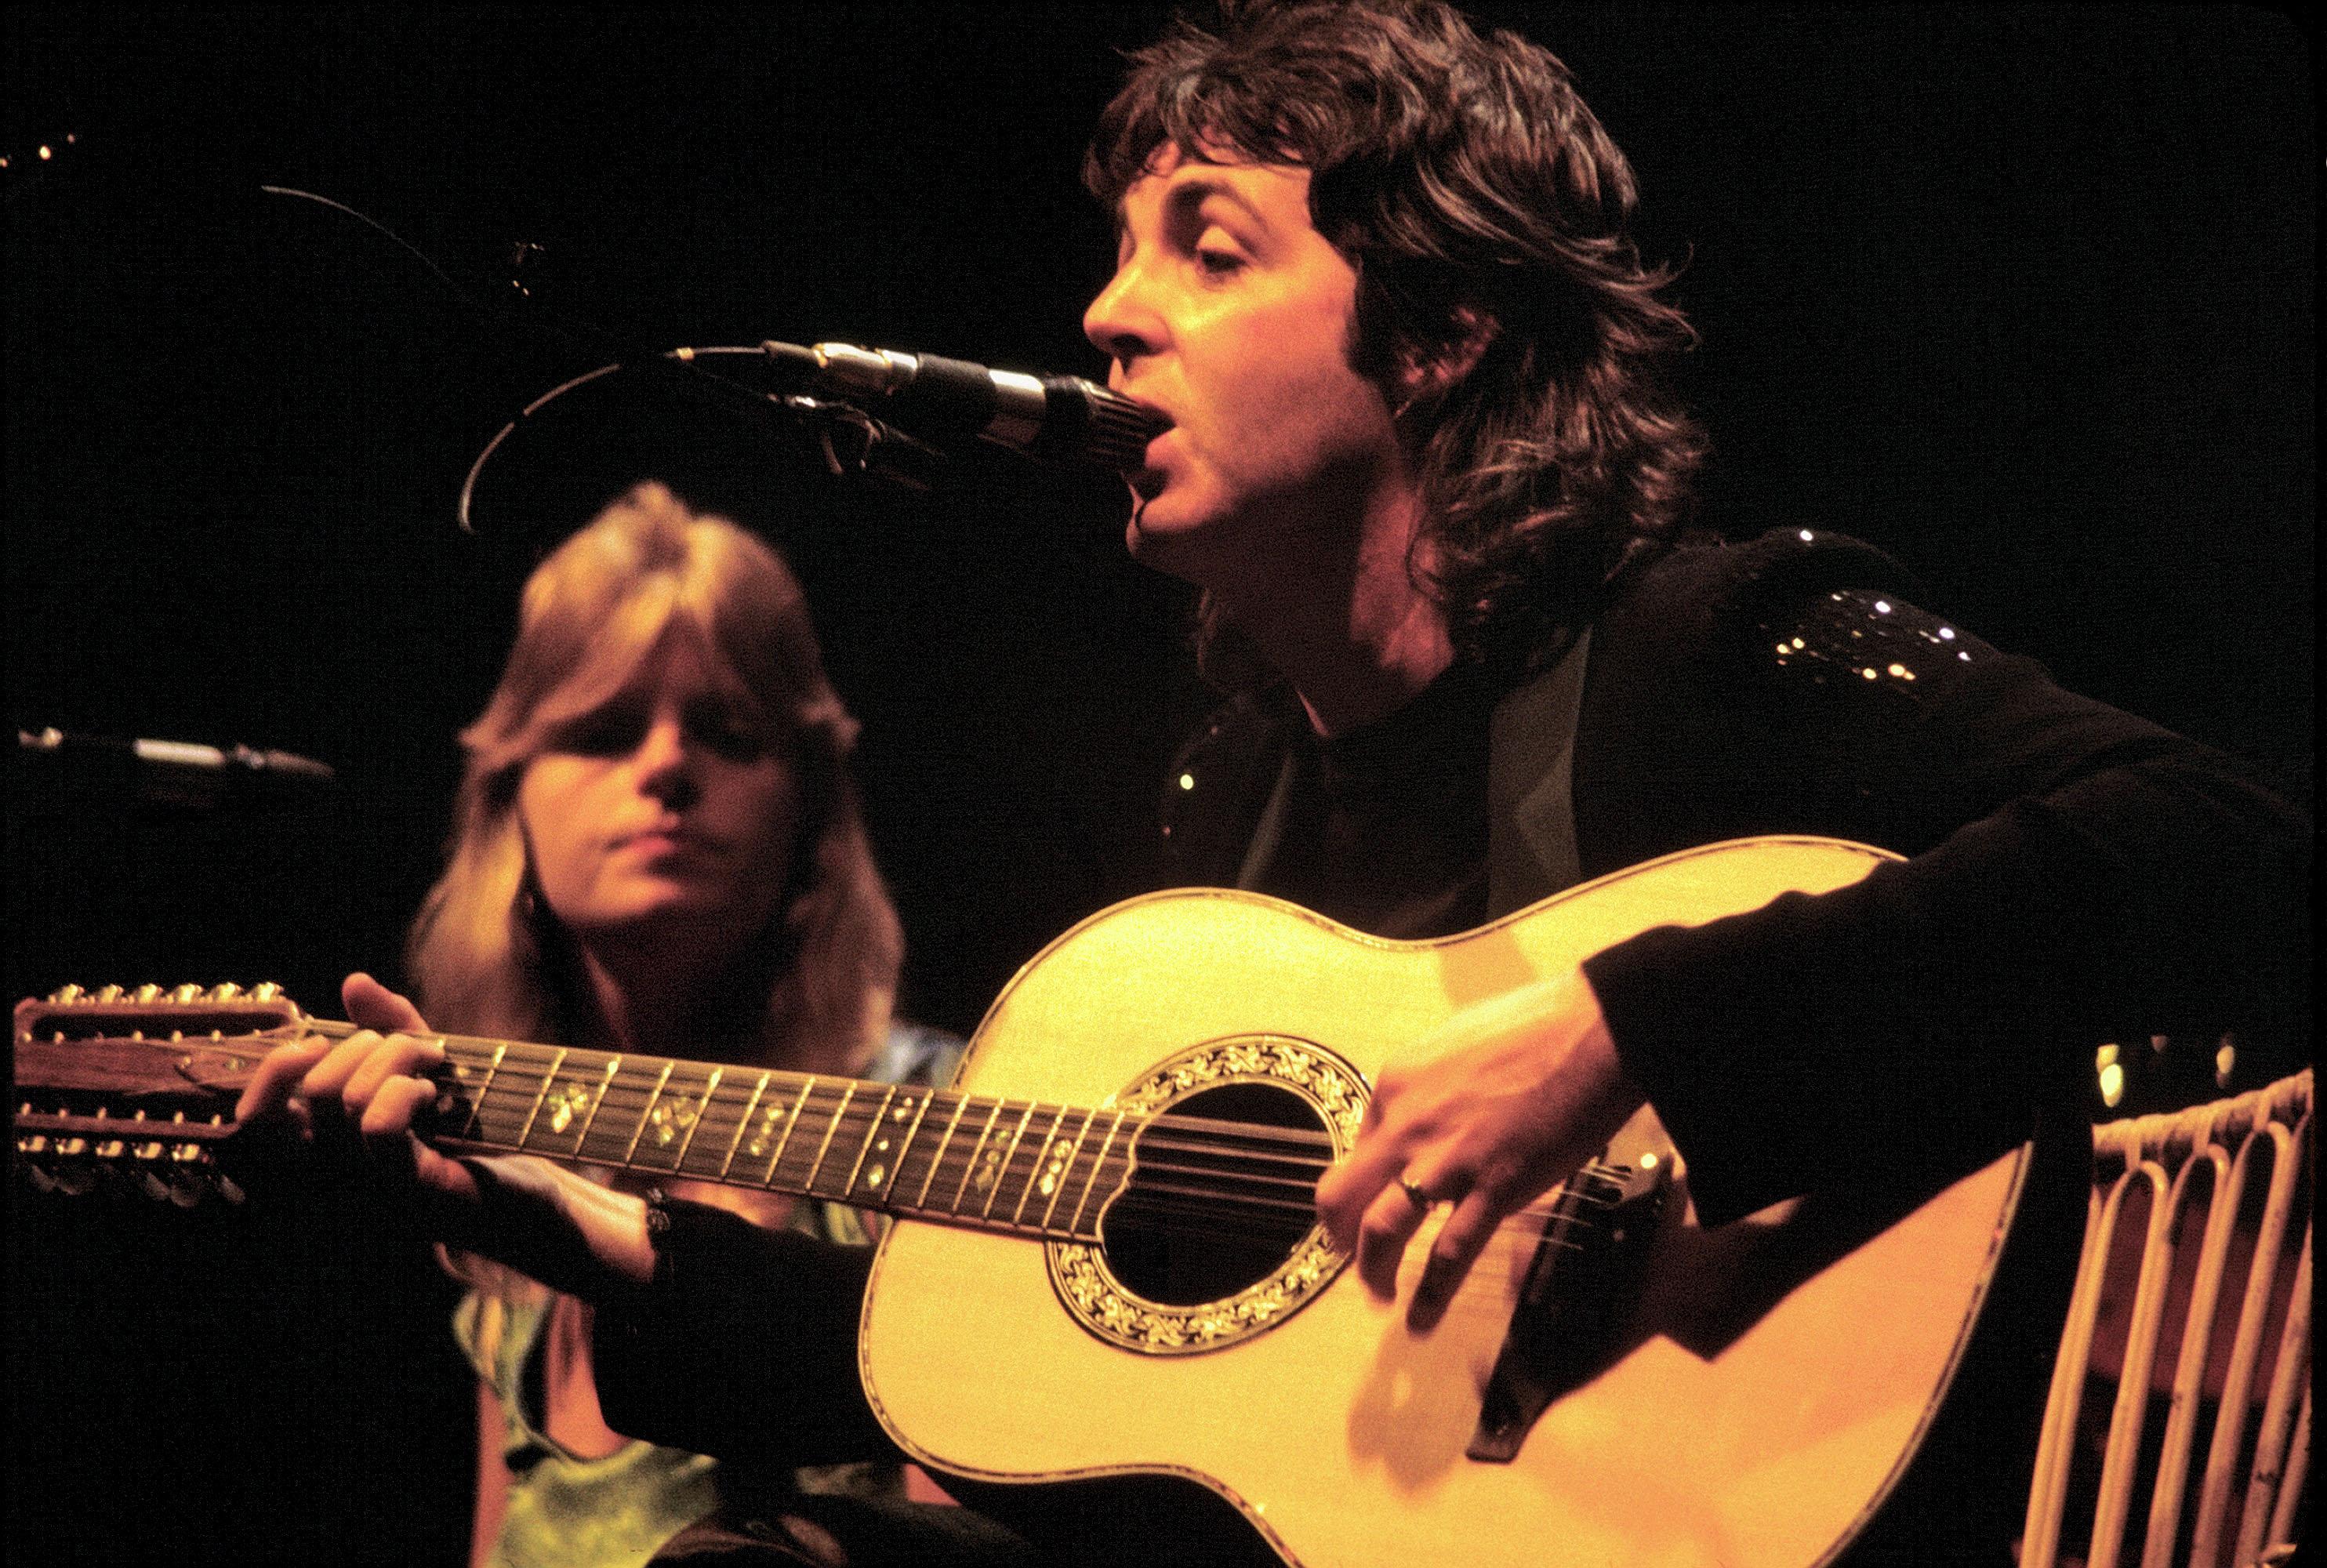 Depiction of Linda McCartney